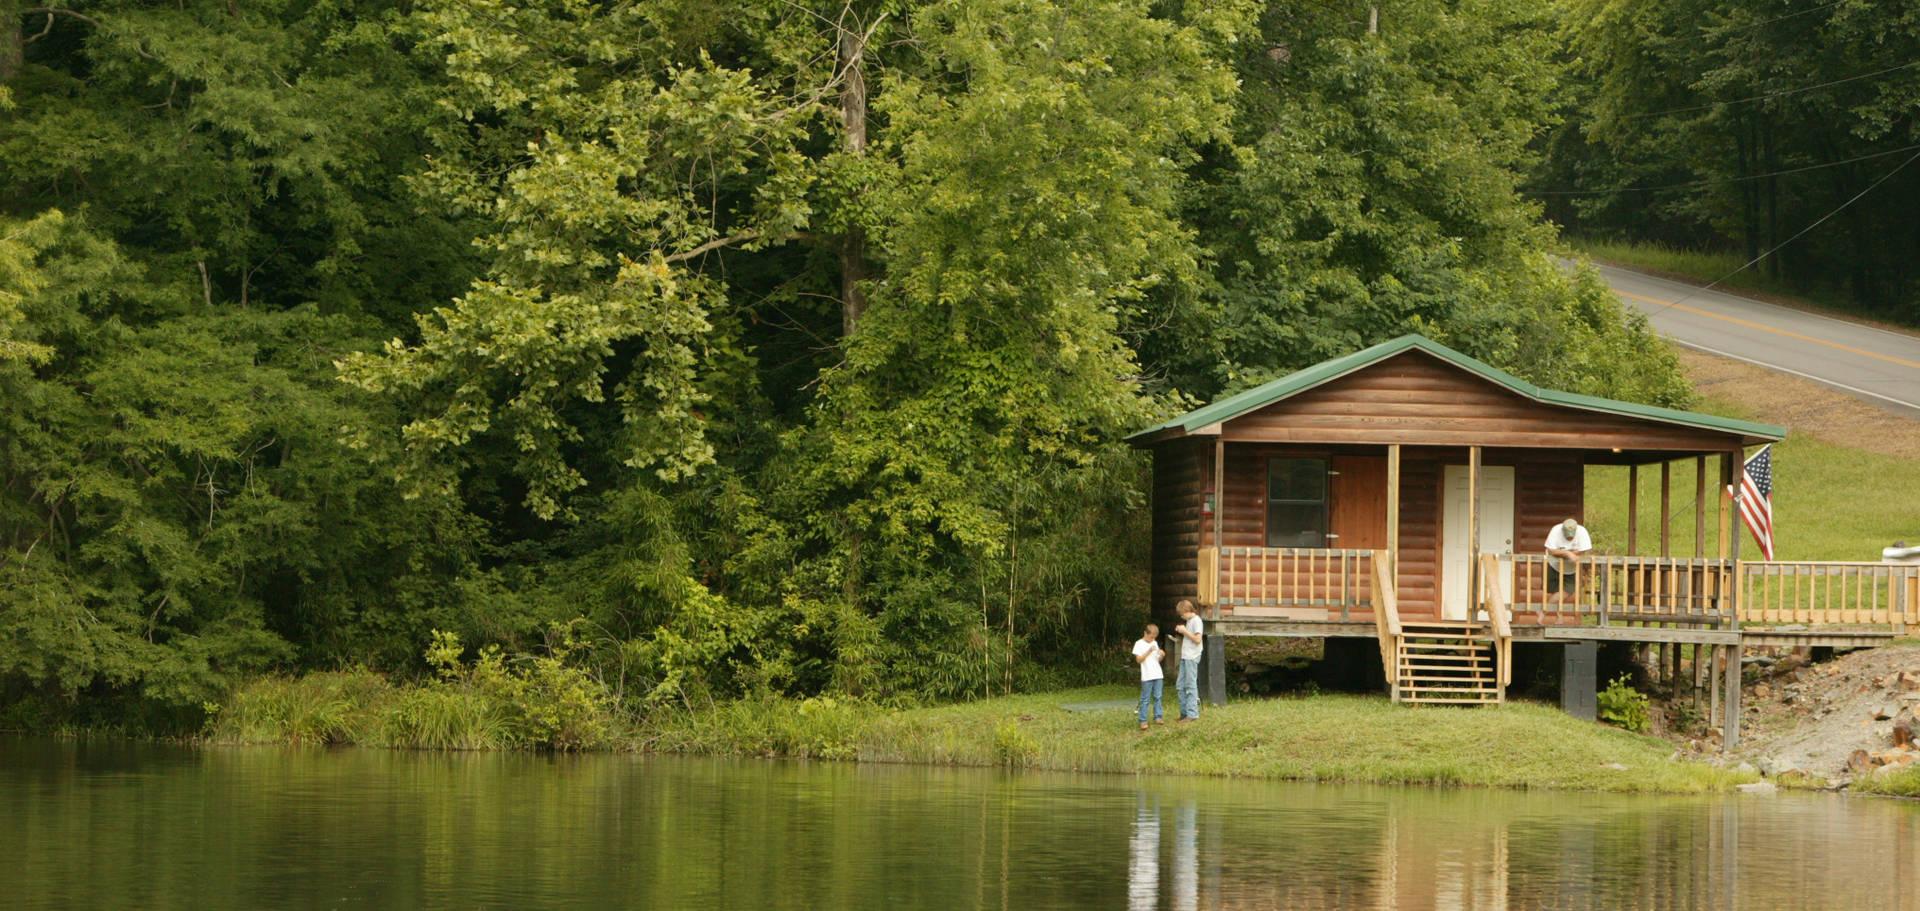 Oklahoma Cabin Getaways Travelok Com Oklahoma S